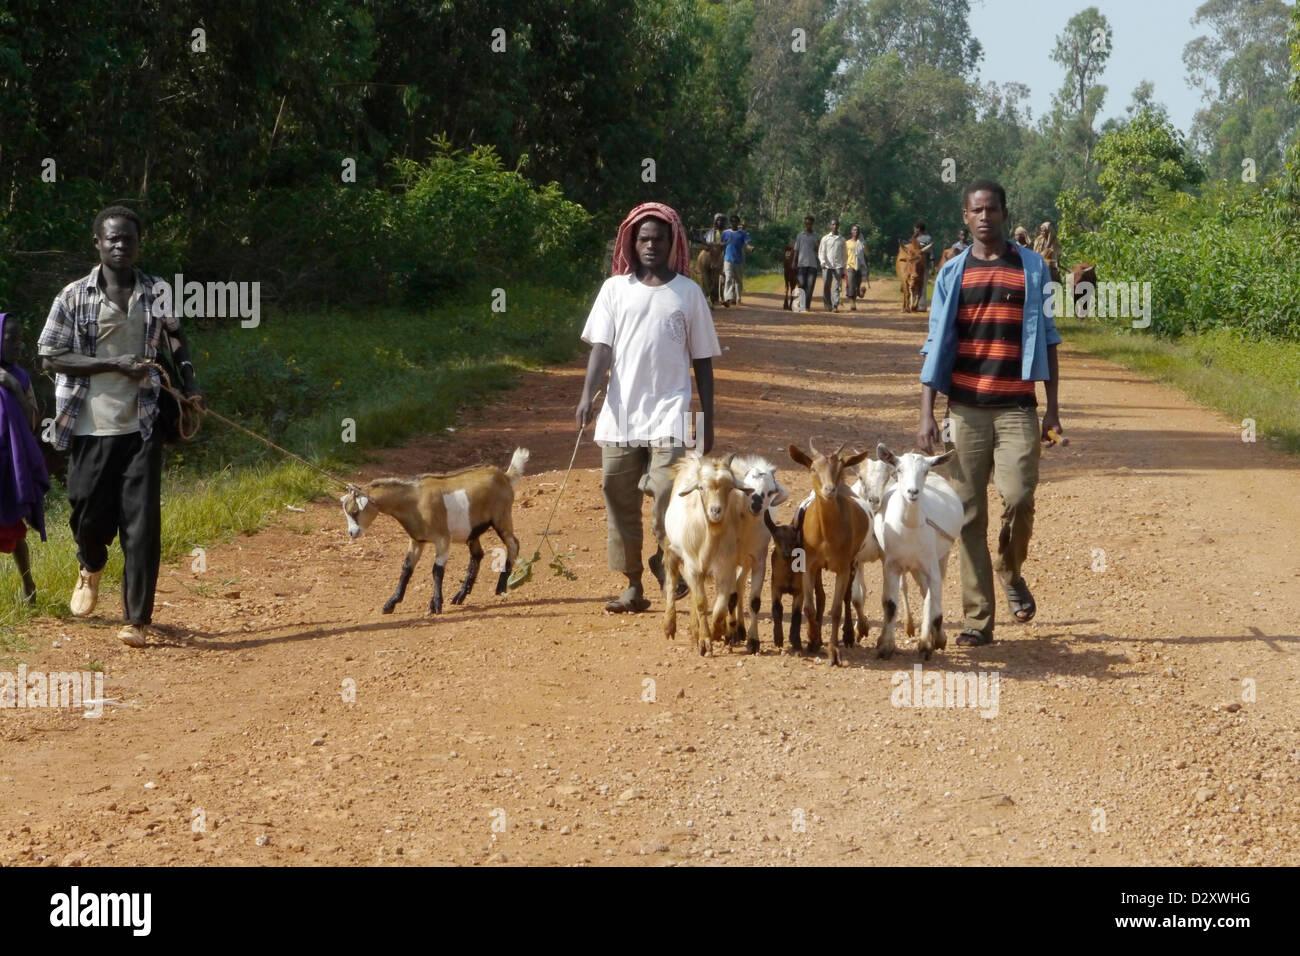 ethiopia road between chagni debate beni shangul gumuz region men males herding goats transport carry load Stock Photo